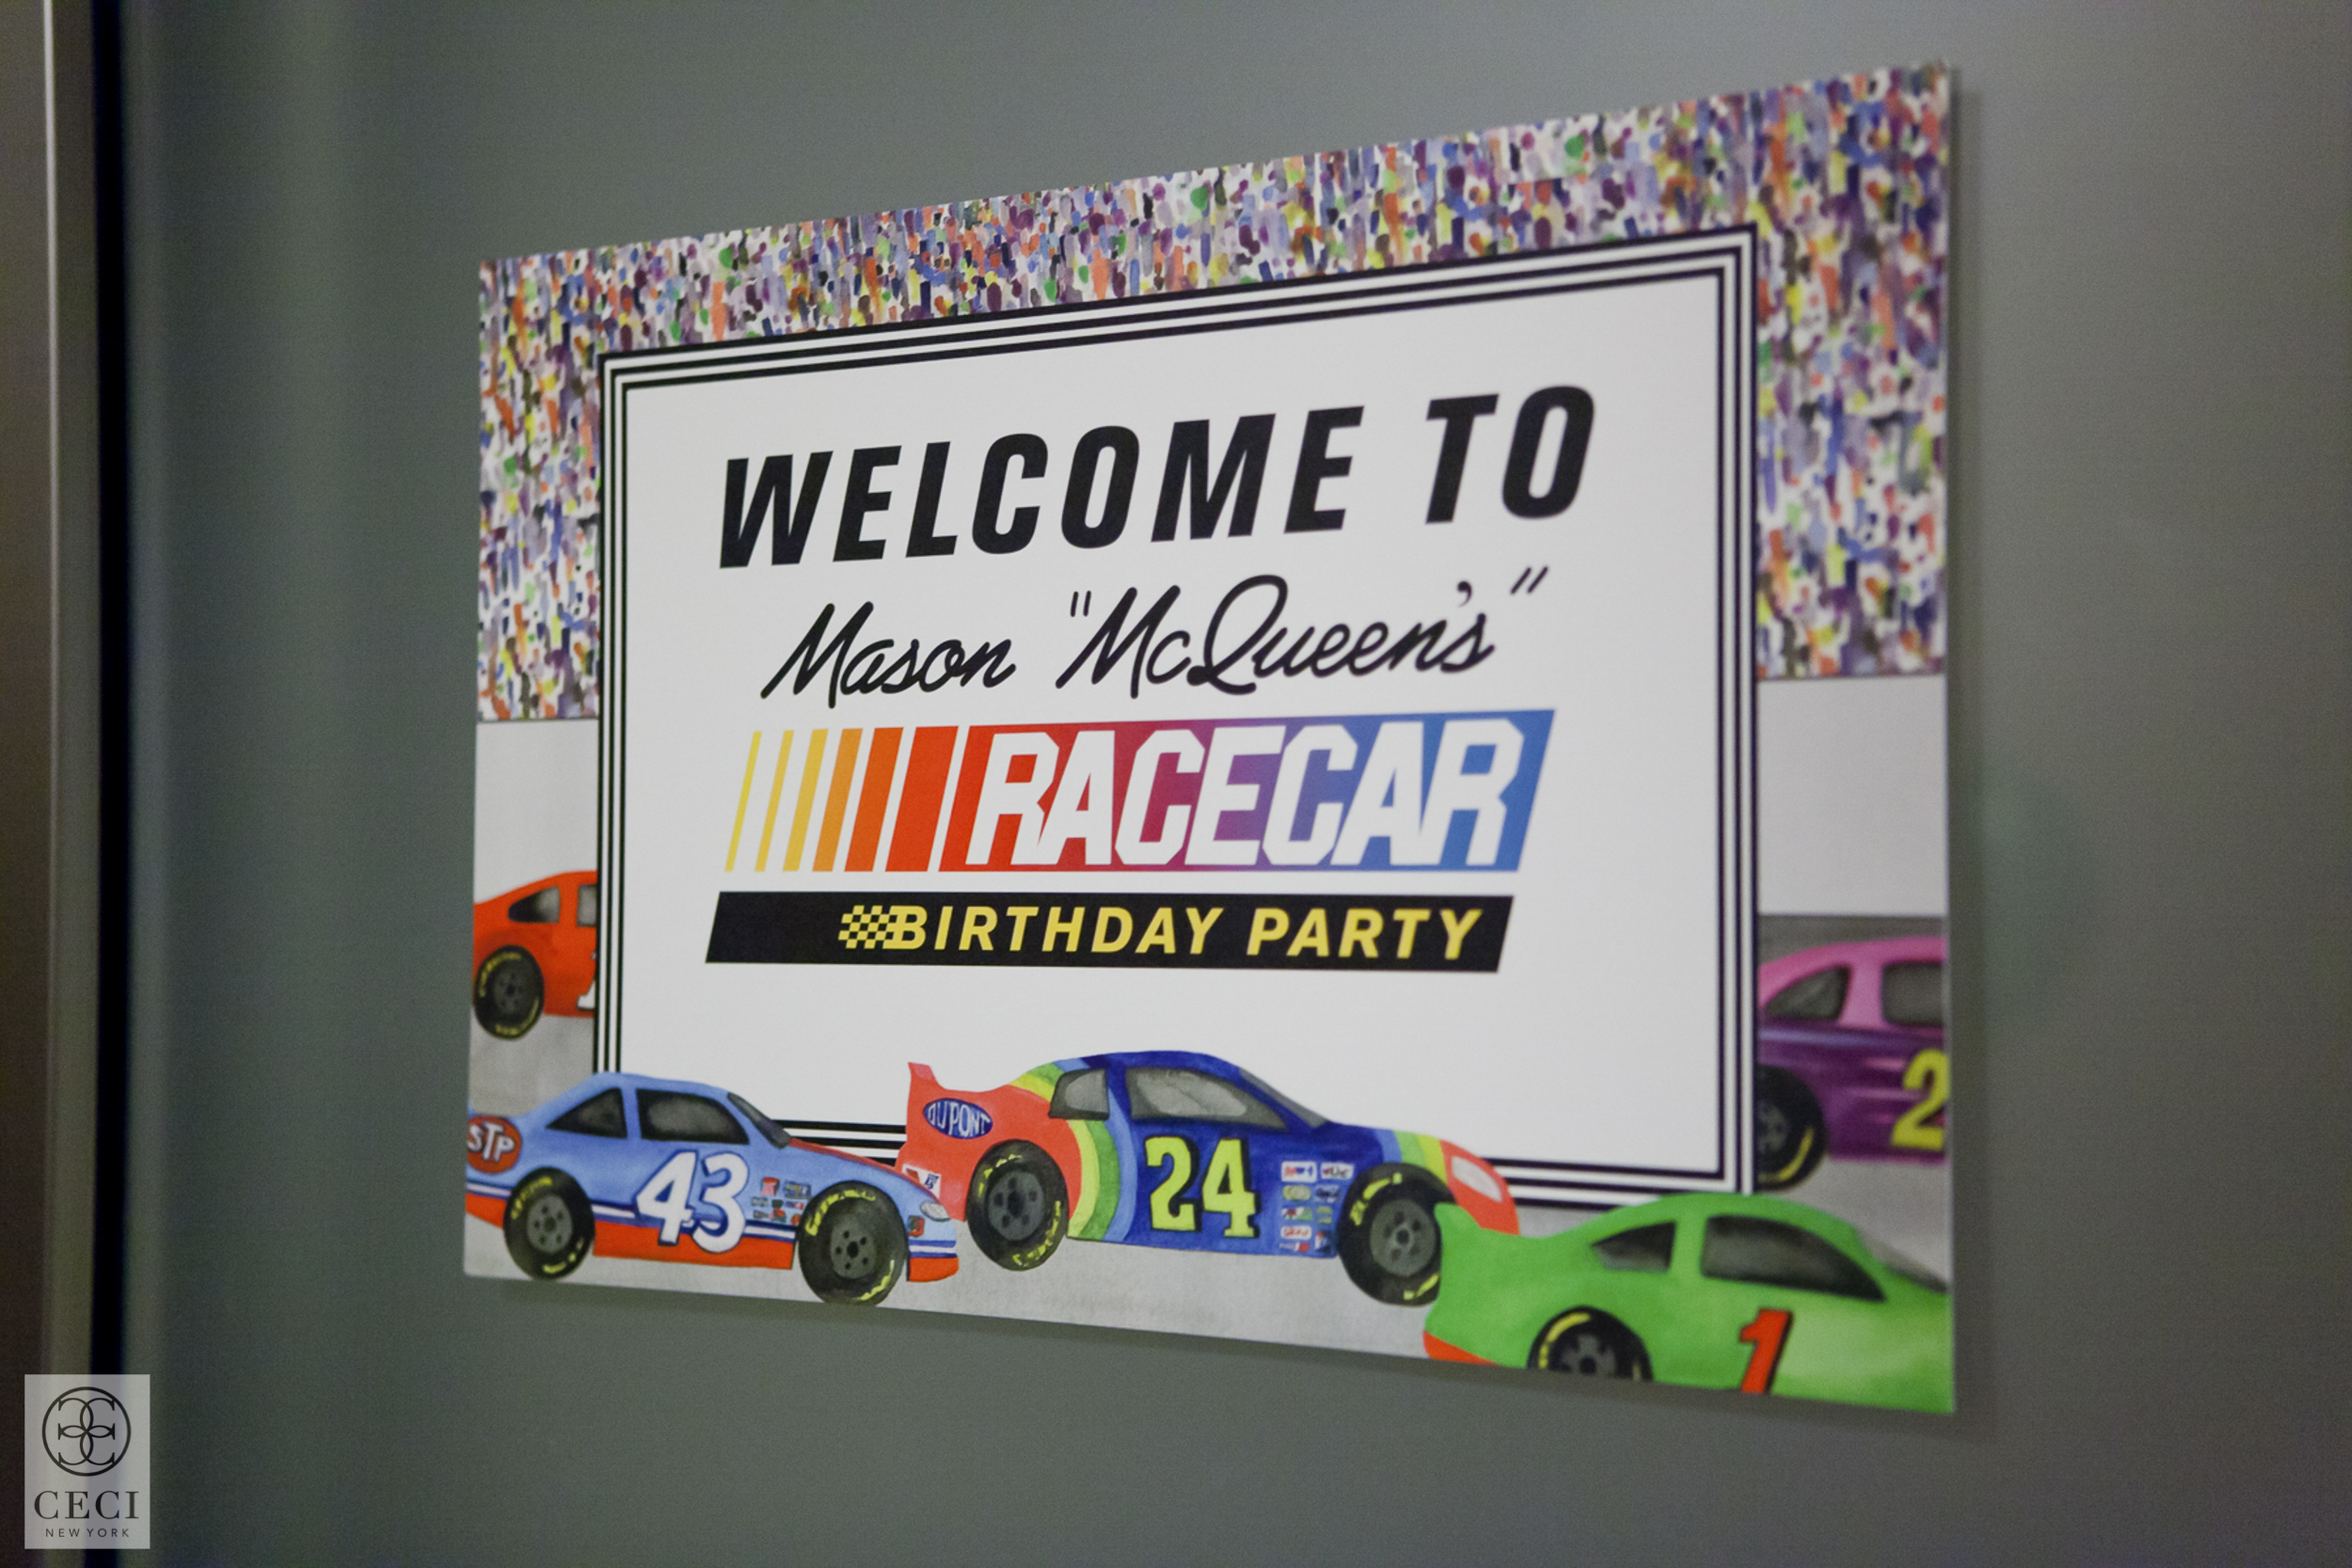 ceci_new_york_mason_ceci_johnson_race_car_birthday_party-10.jpg